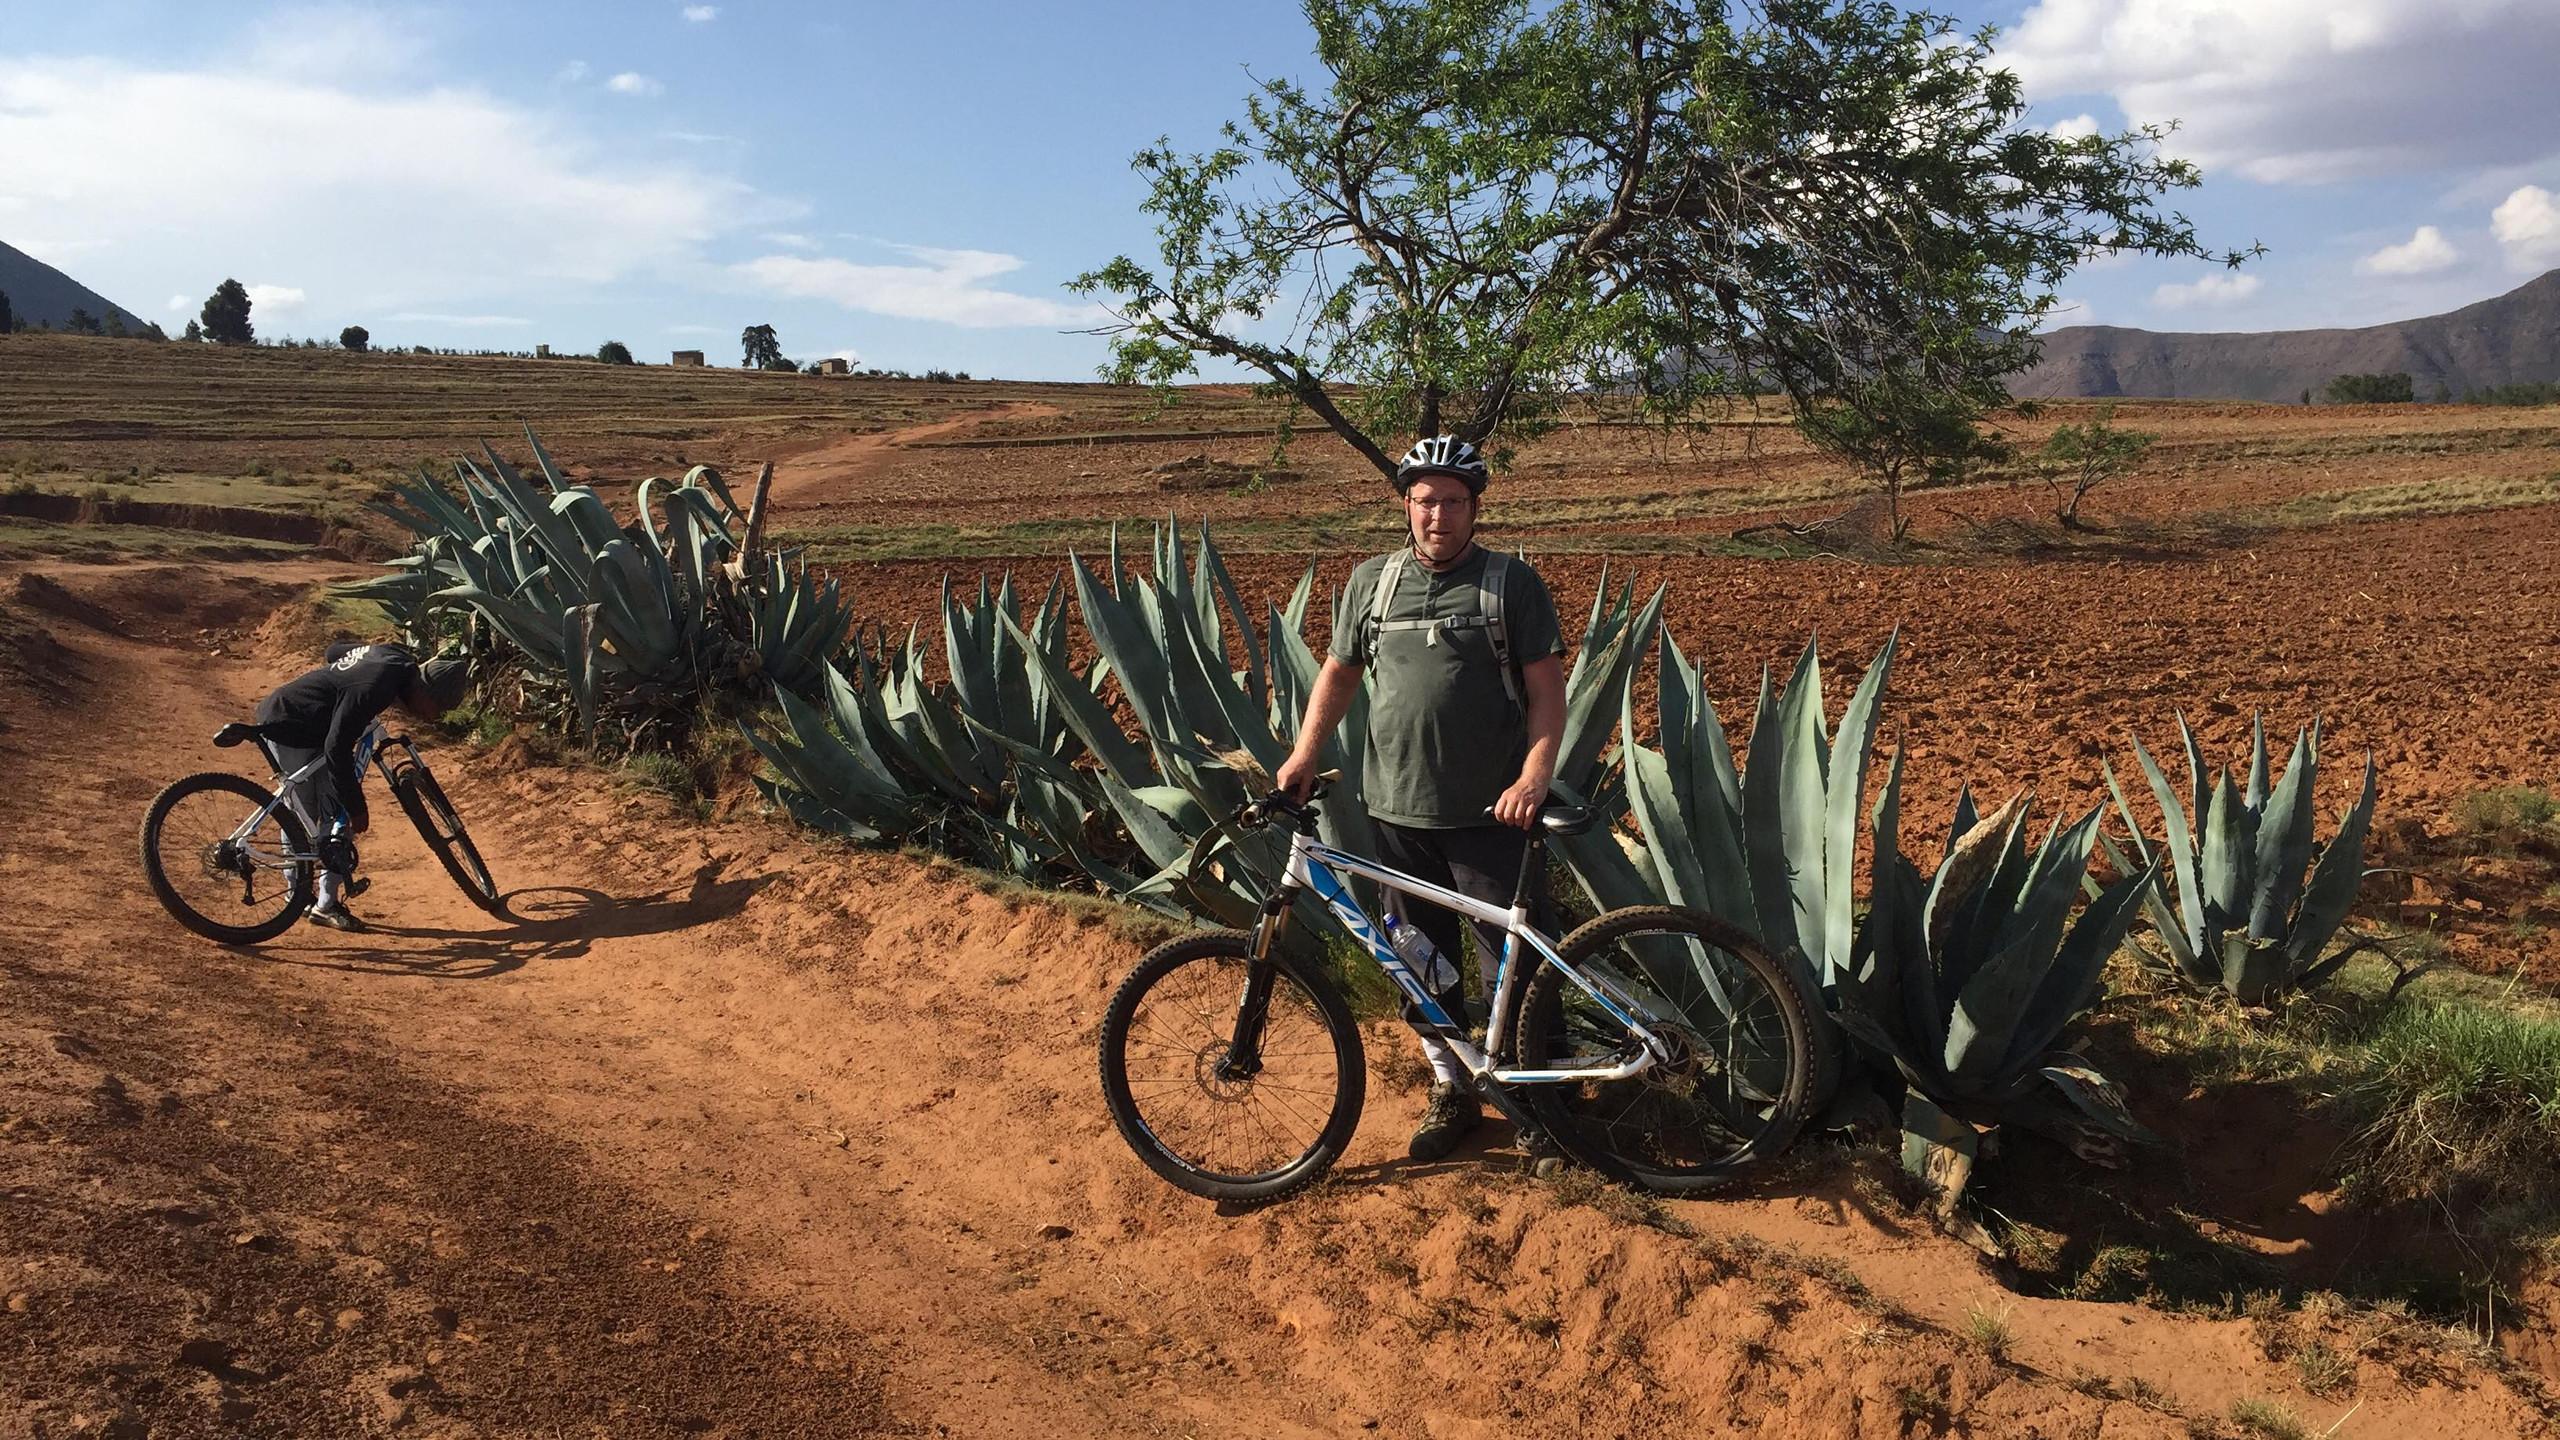 Biking in Lesetho, Africa